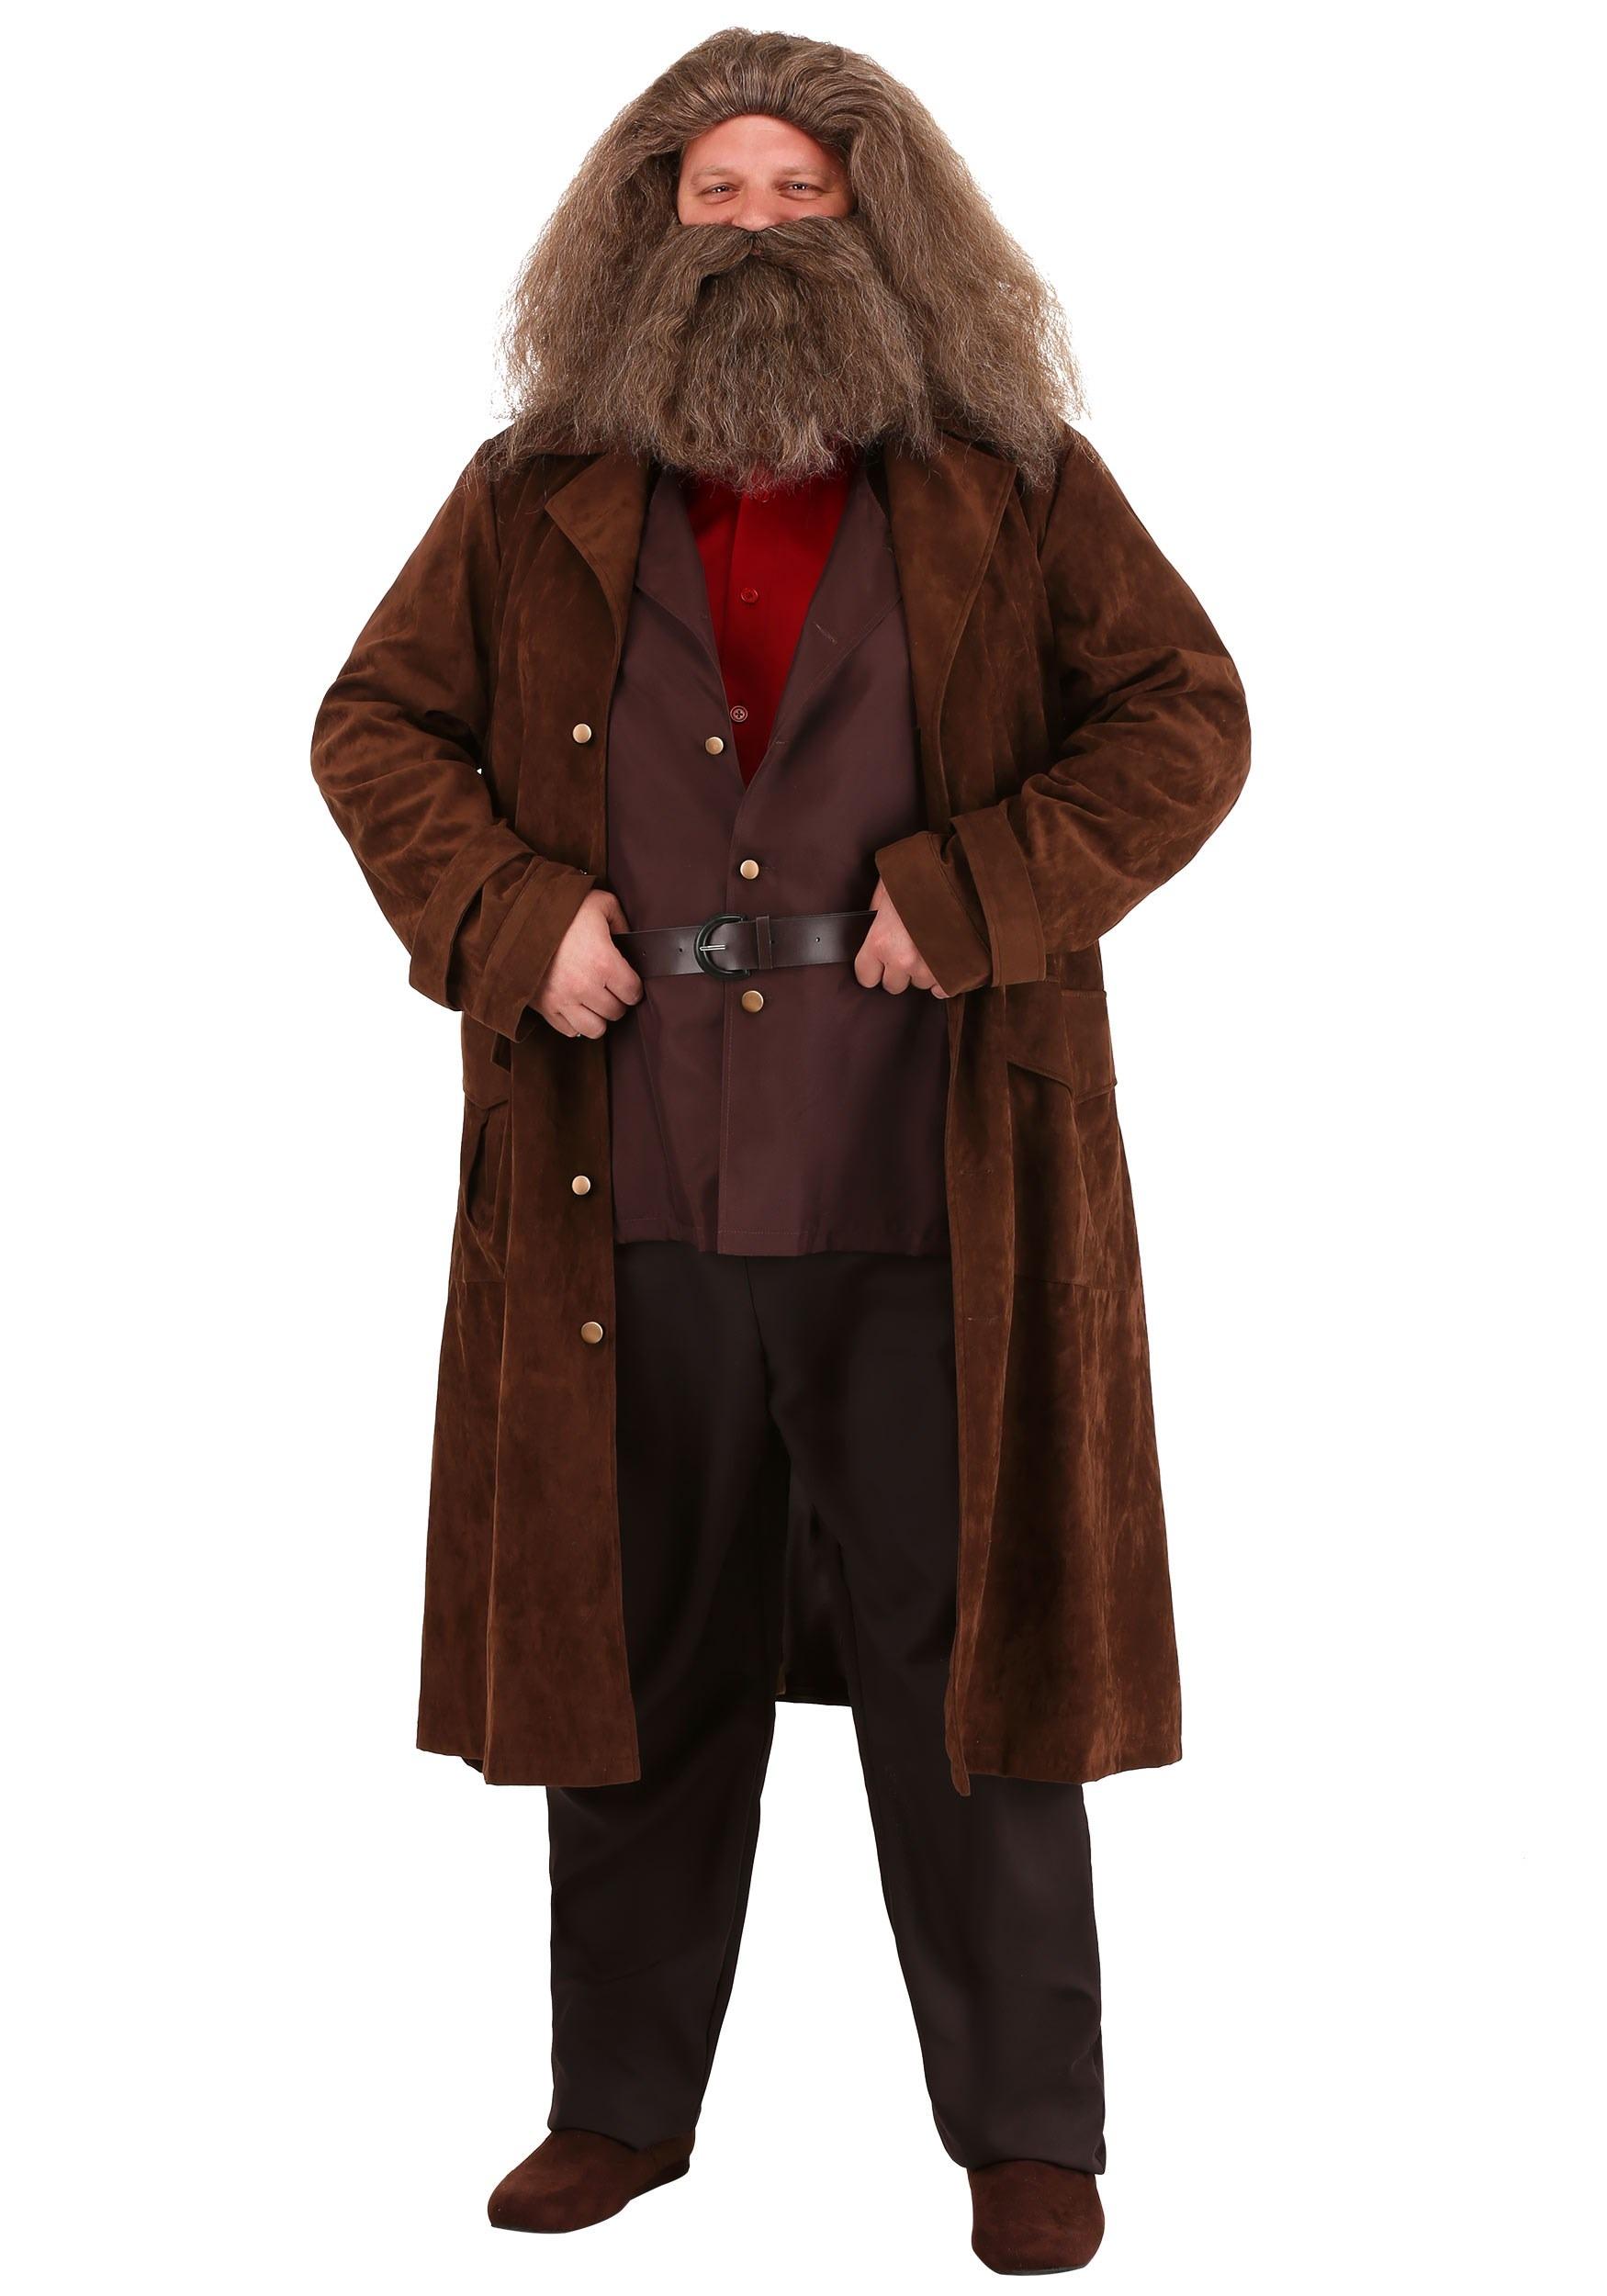 Plus Size-Deluxe Harry Potter Hagrid Costume